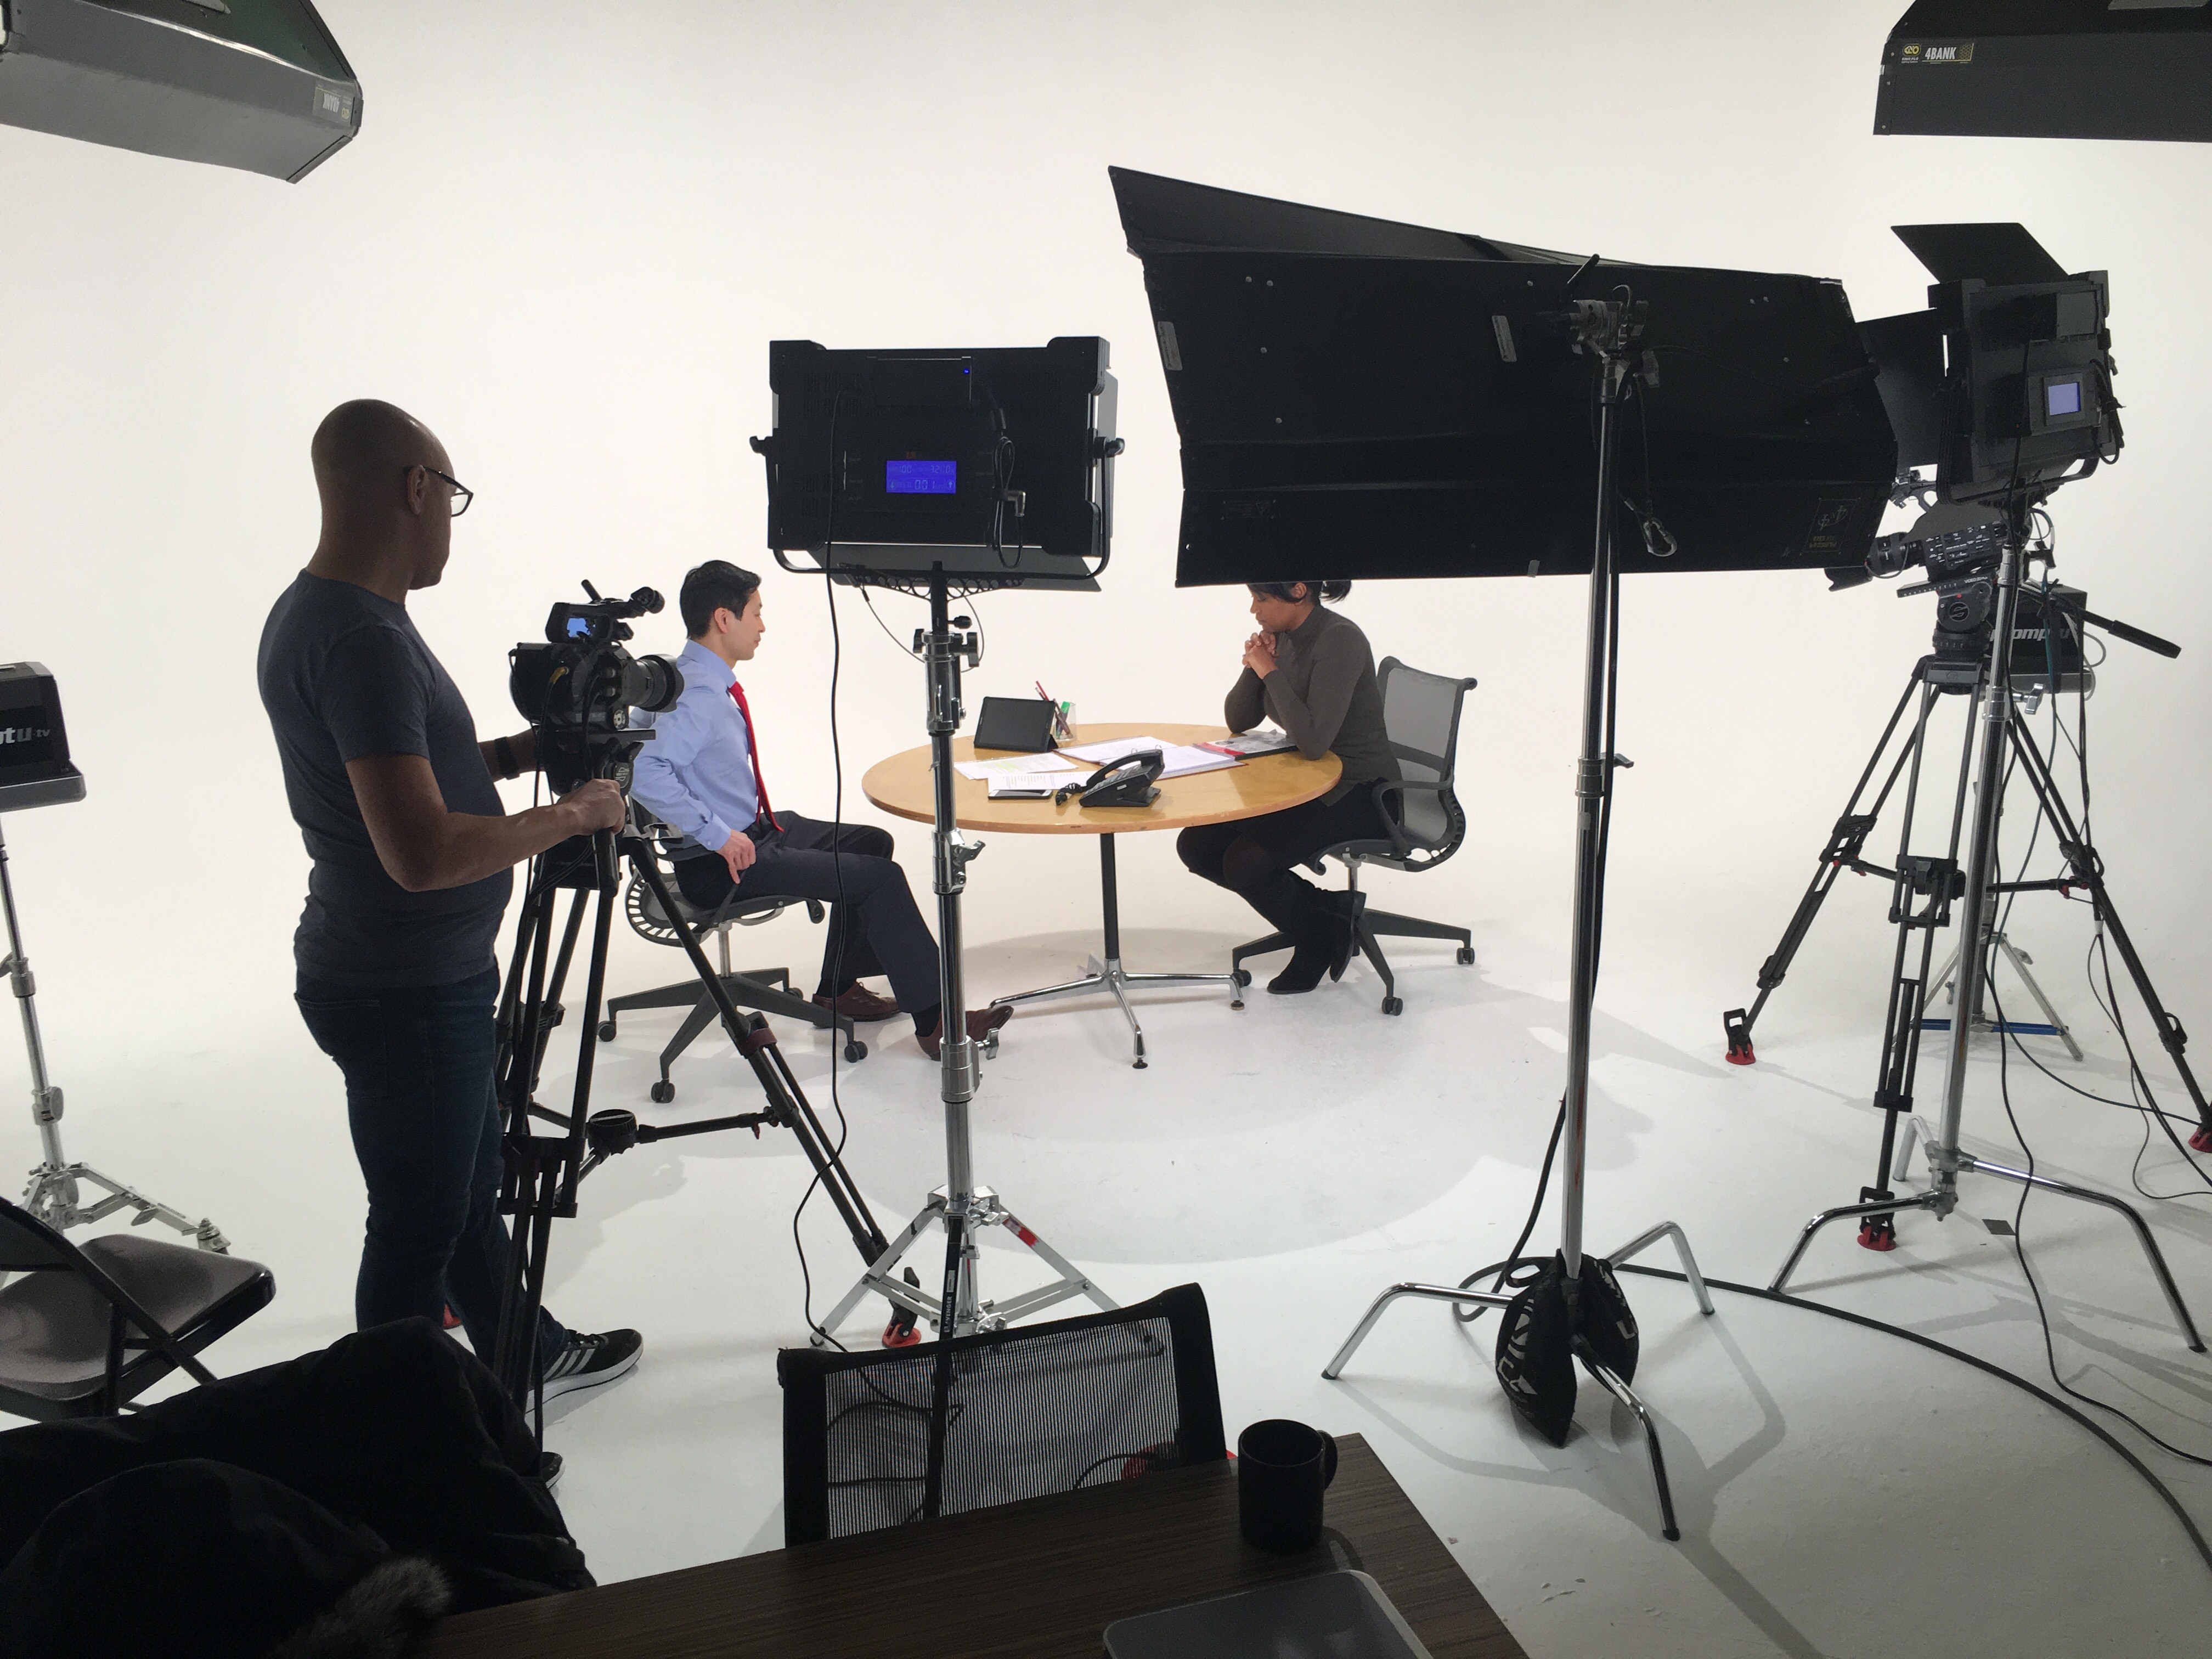 Filming with full 4k kit